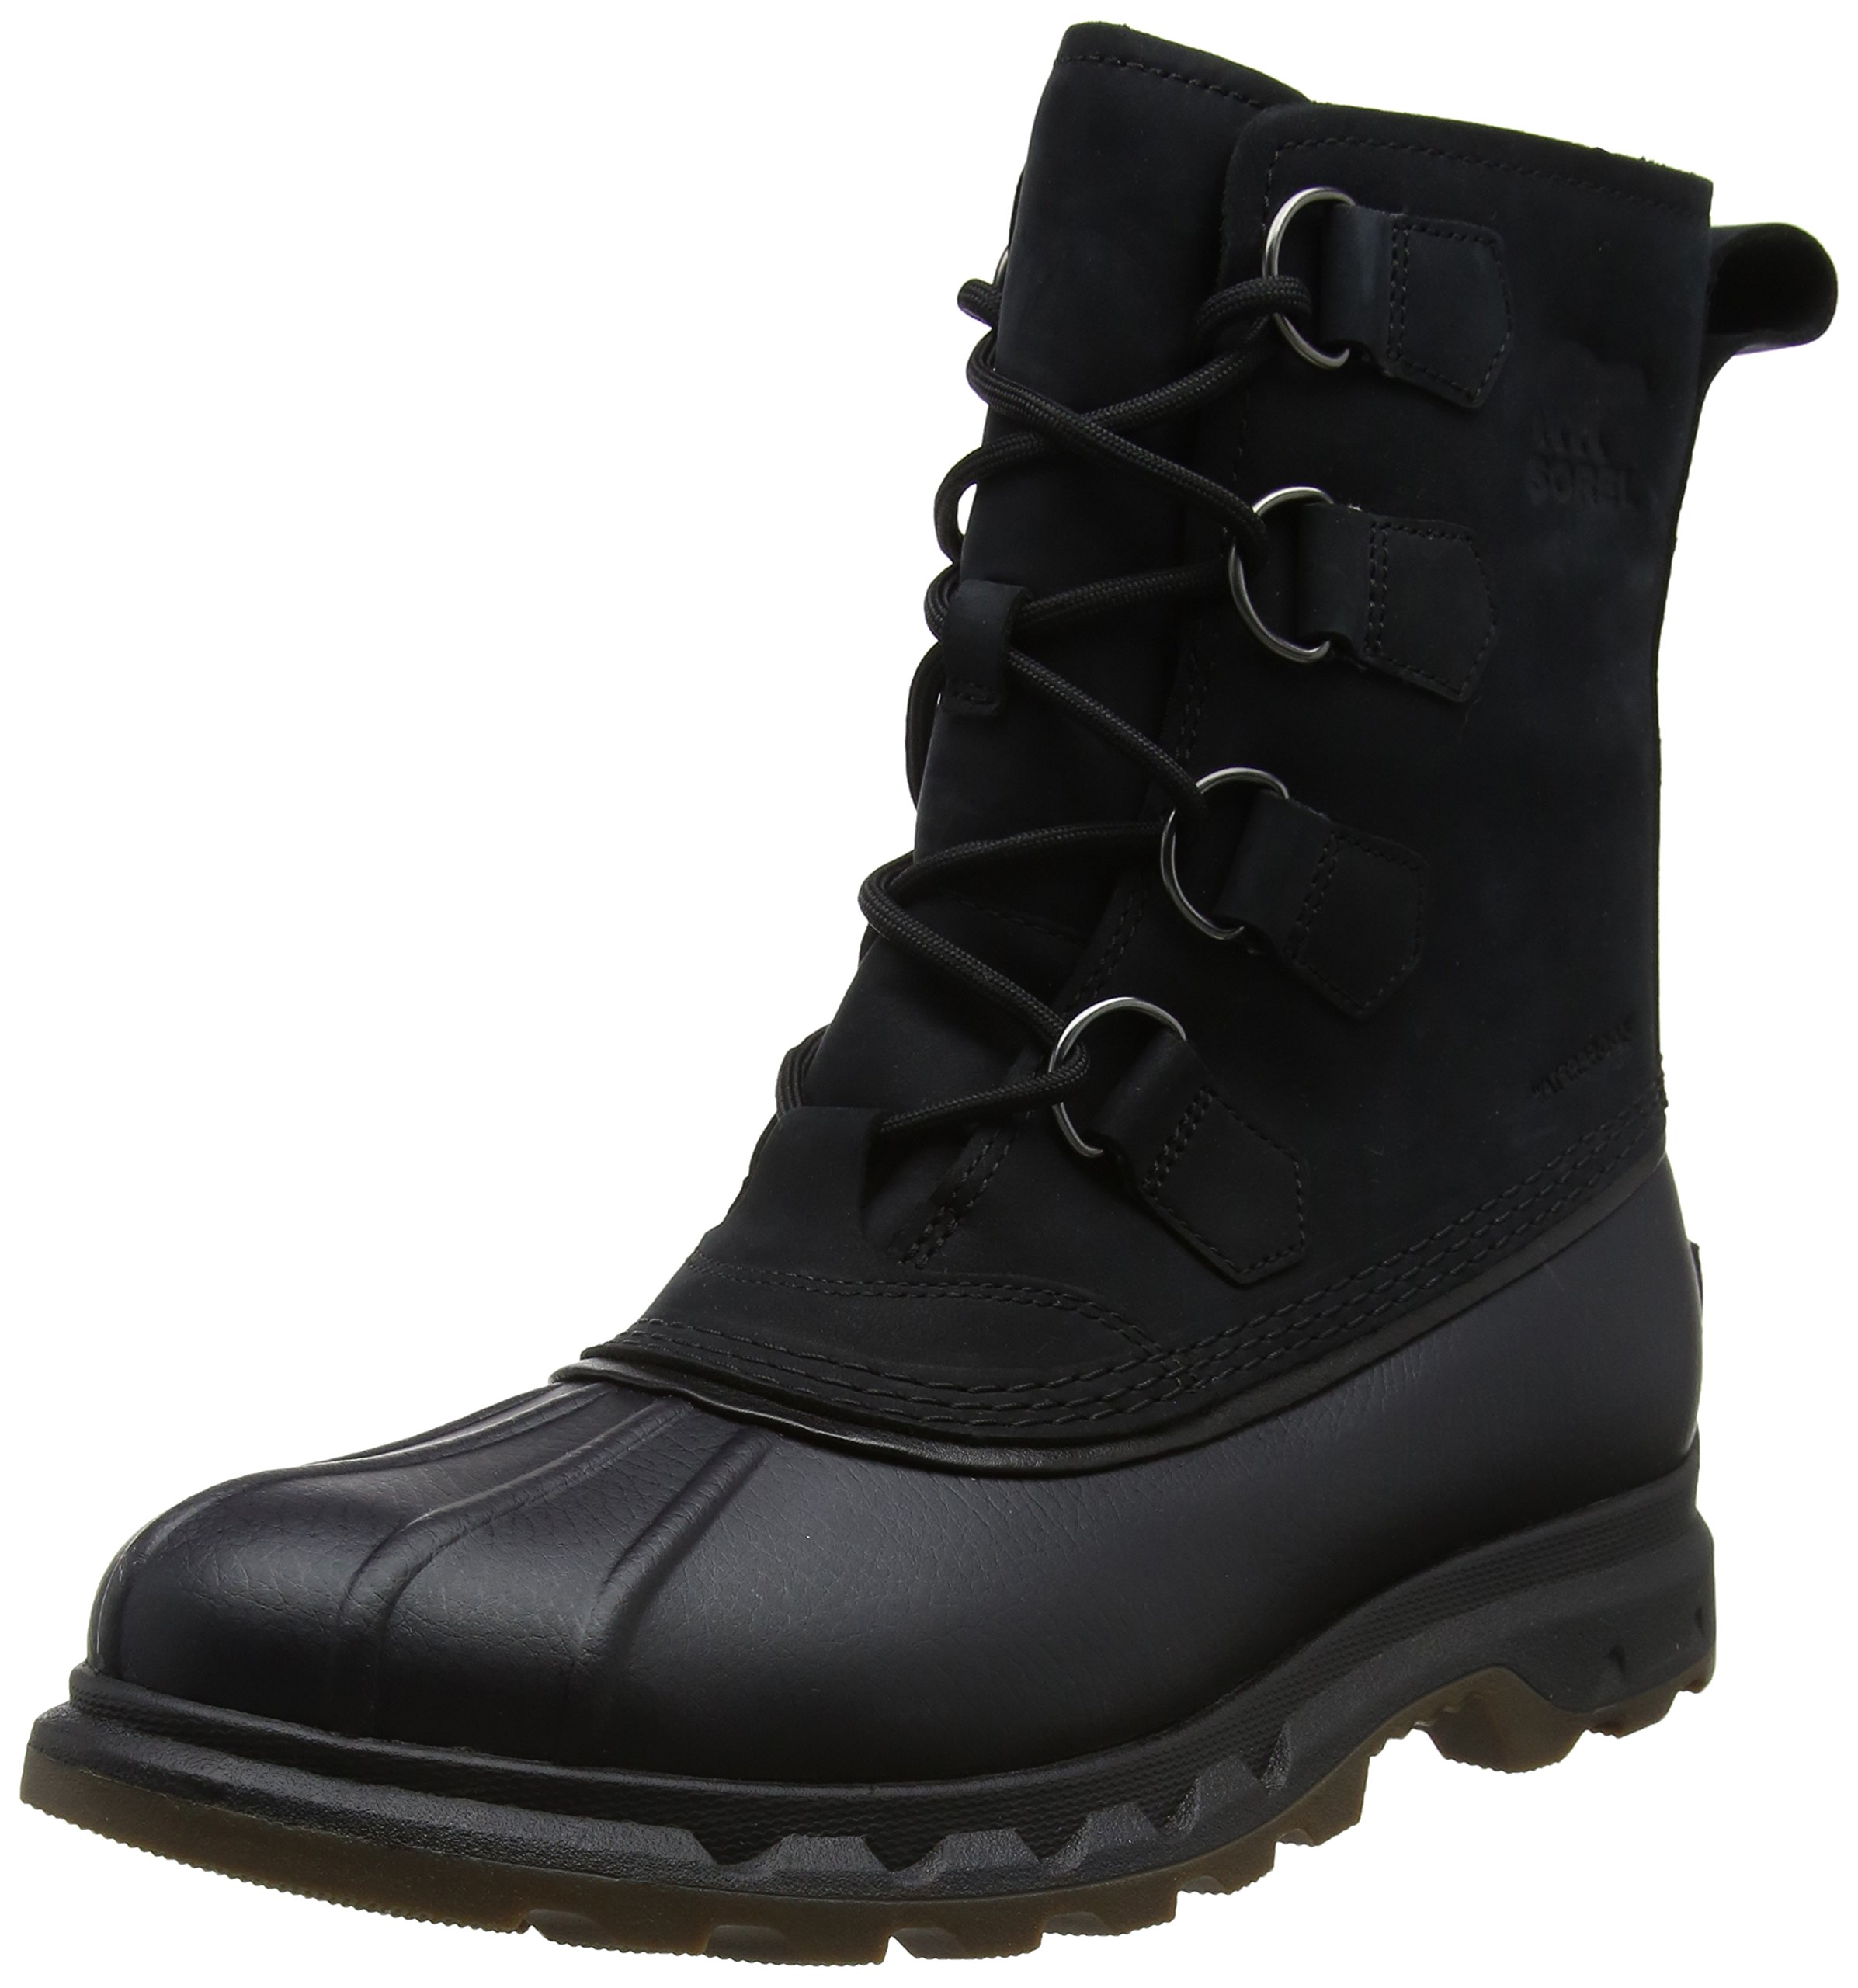 De 5 Portzman Black43 Neige HommeNoir Eu Sorel ClassicBottes bfvY6g7y